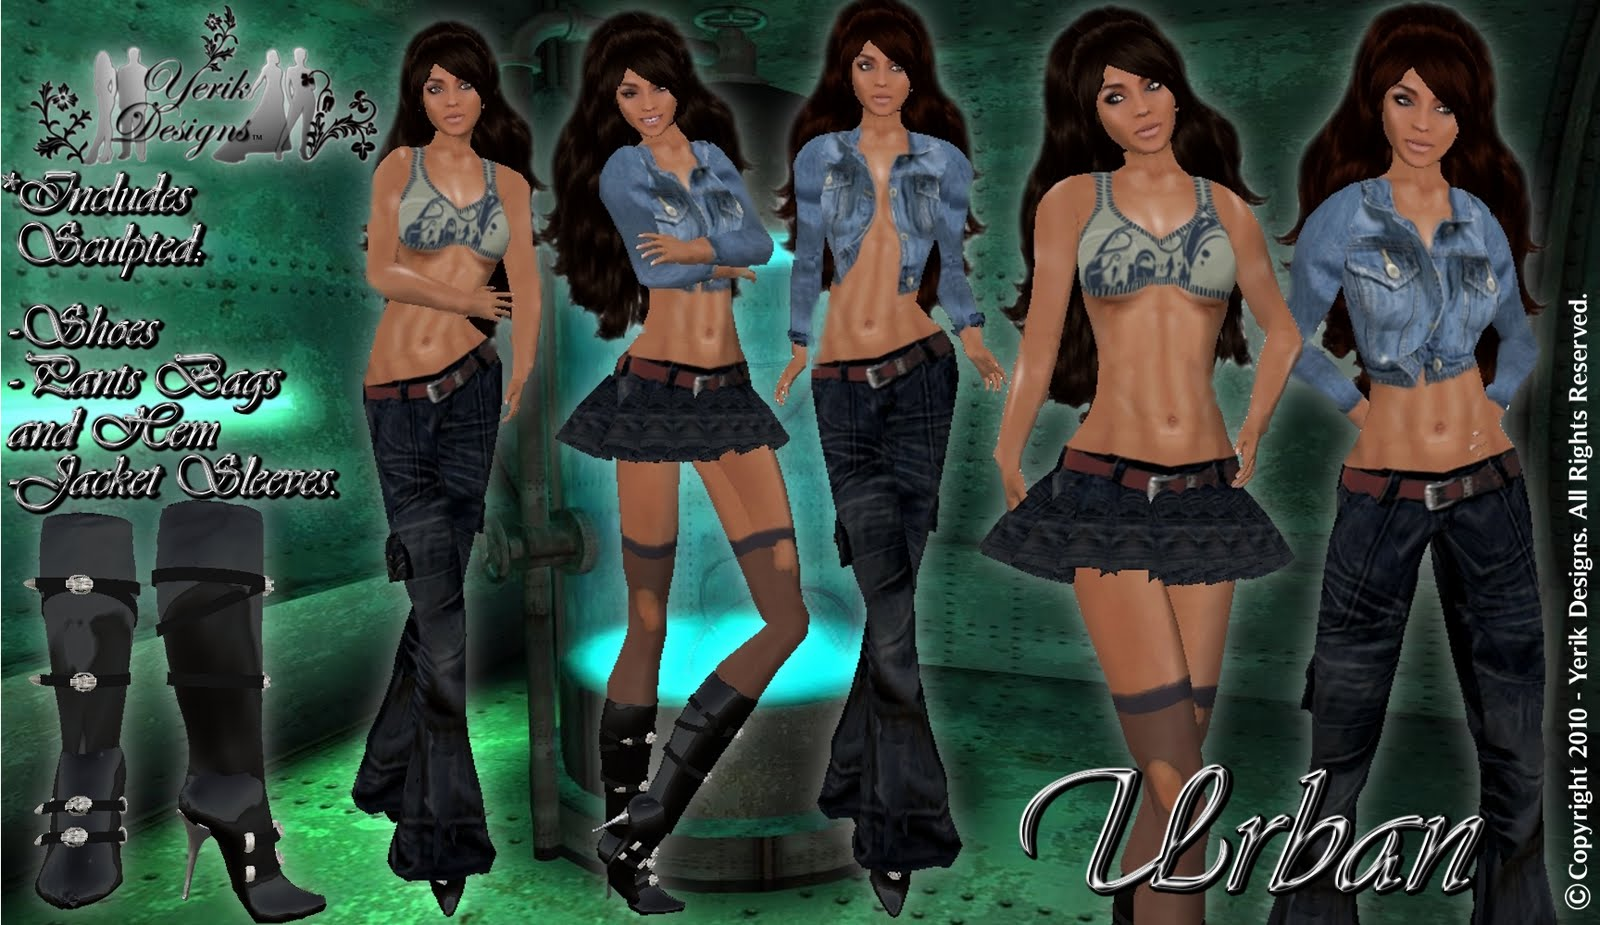 http://2.bp.blogspot.com/_-iHvL3BZbEg/TAsAxL7wvWI/AAAAAAAAAEs/lnaItL195gY/s1600/Urban+Woman.jpg